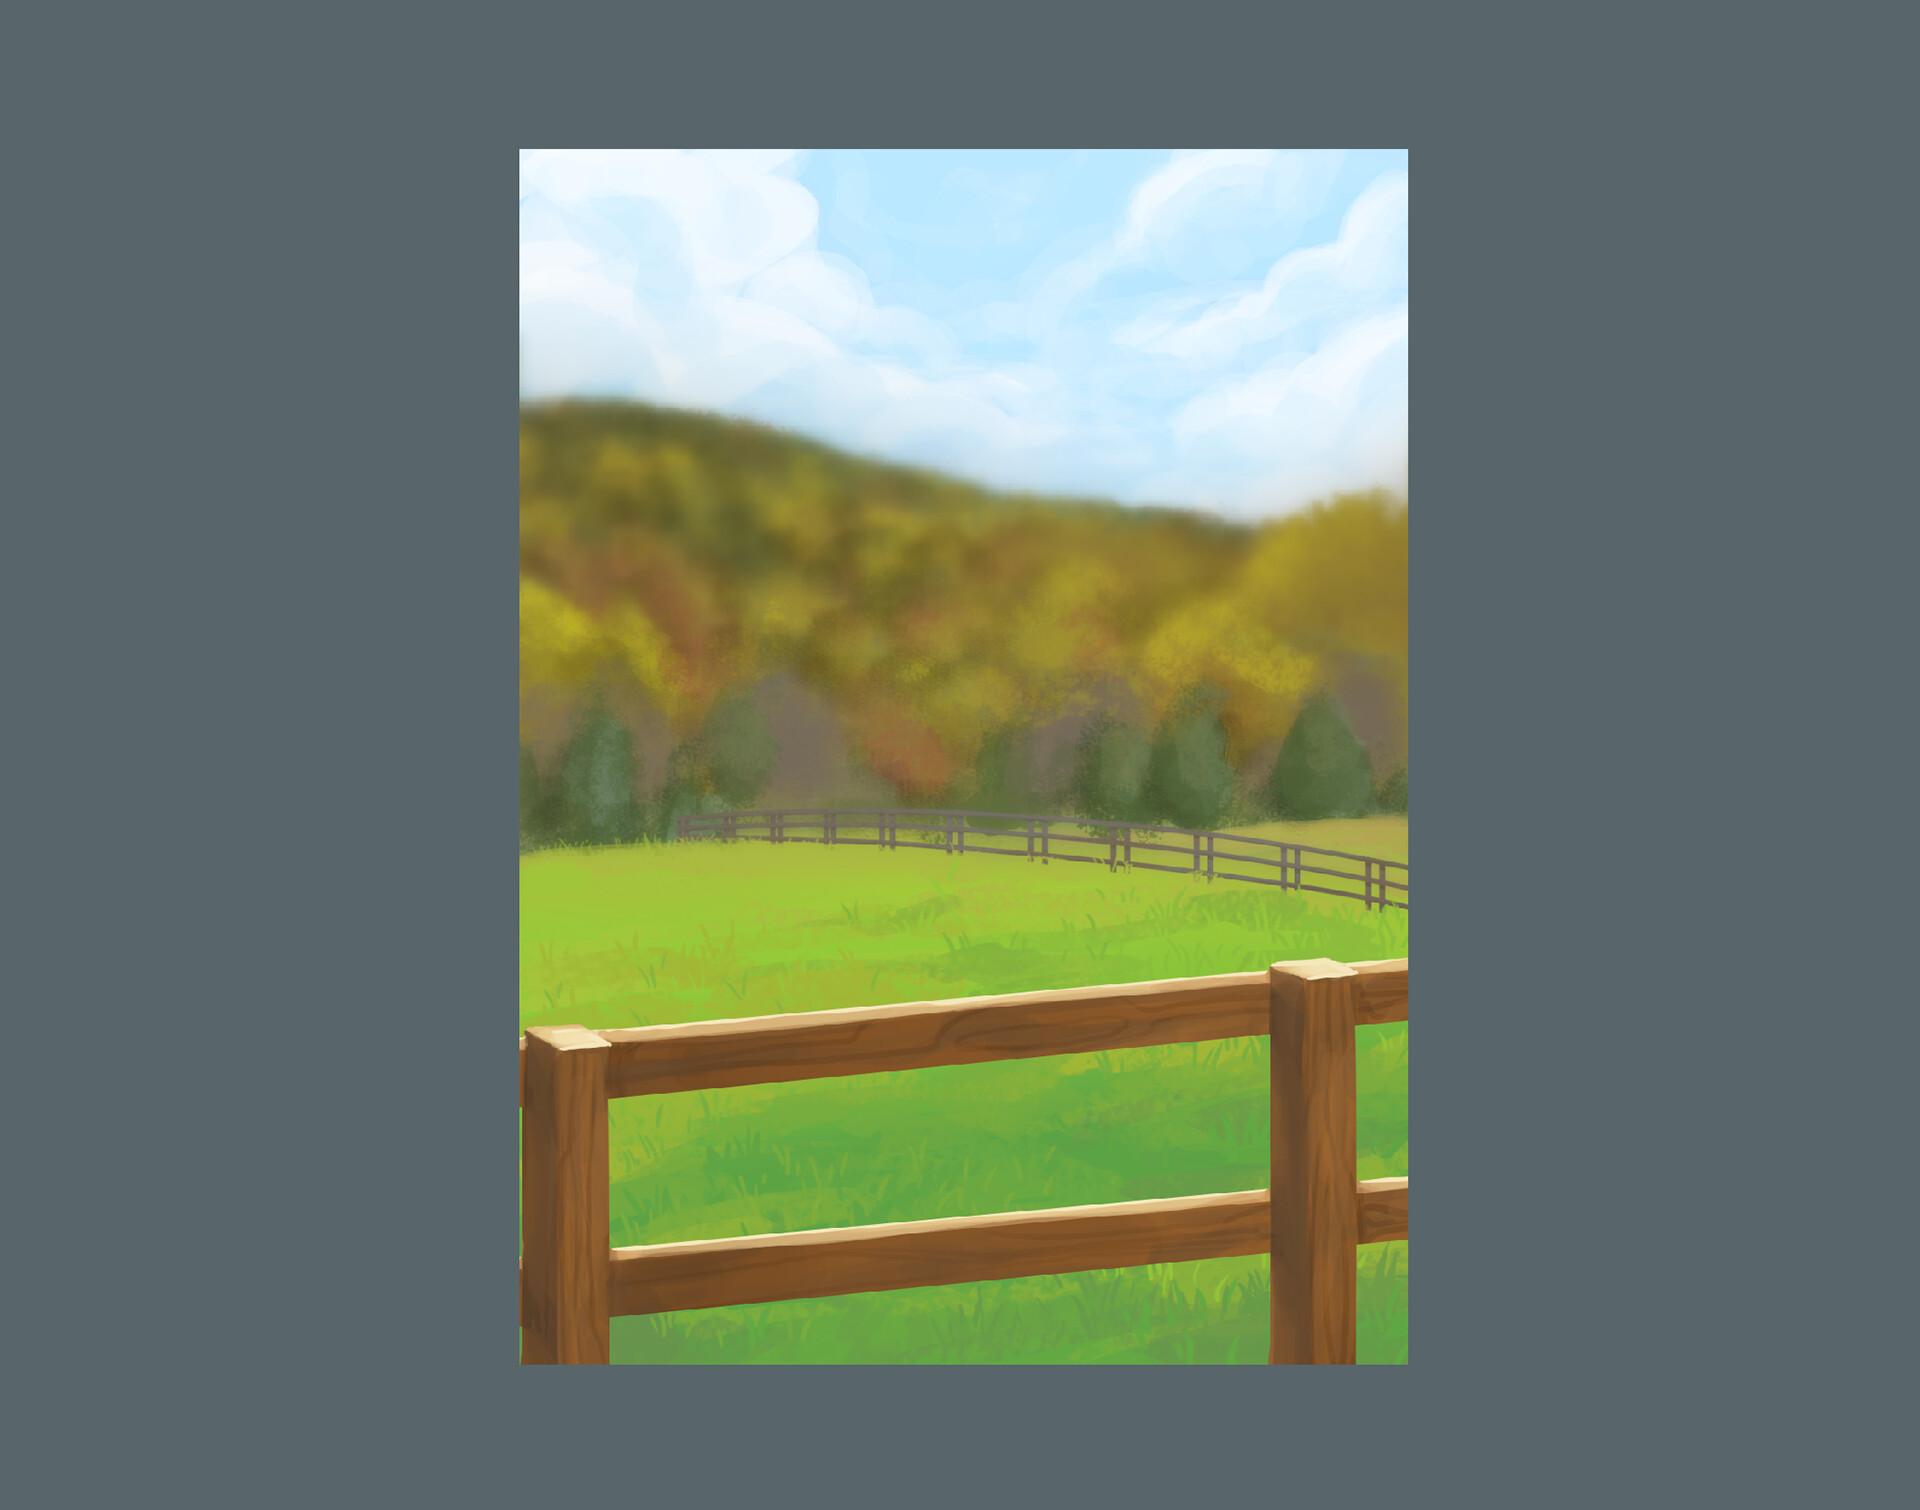 Character creator backdrop painting